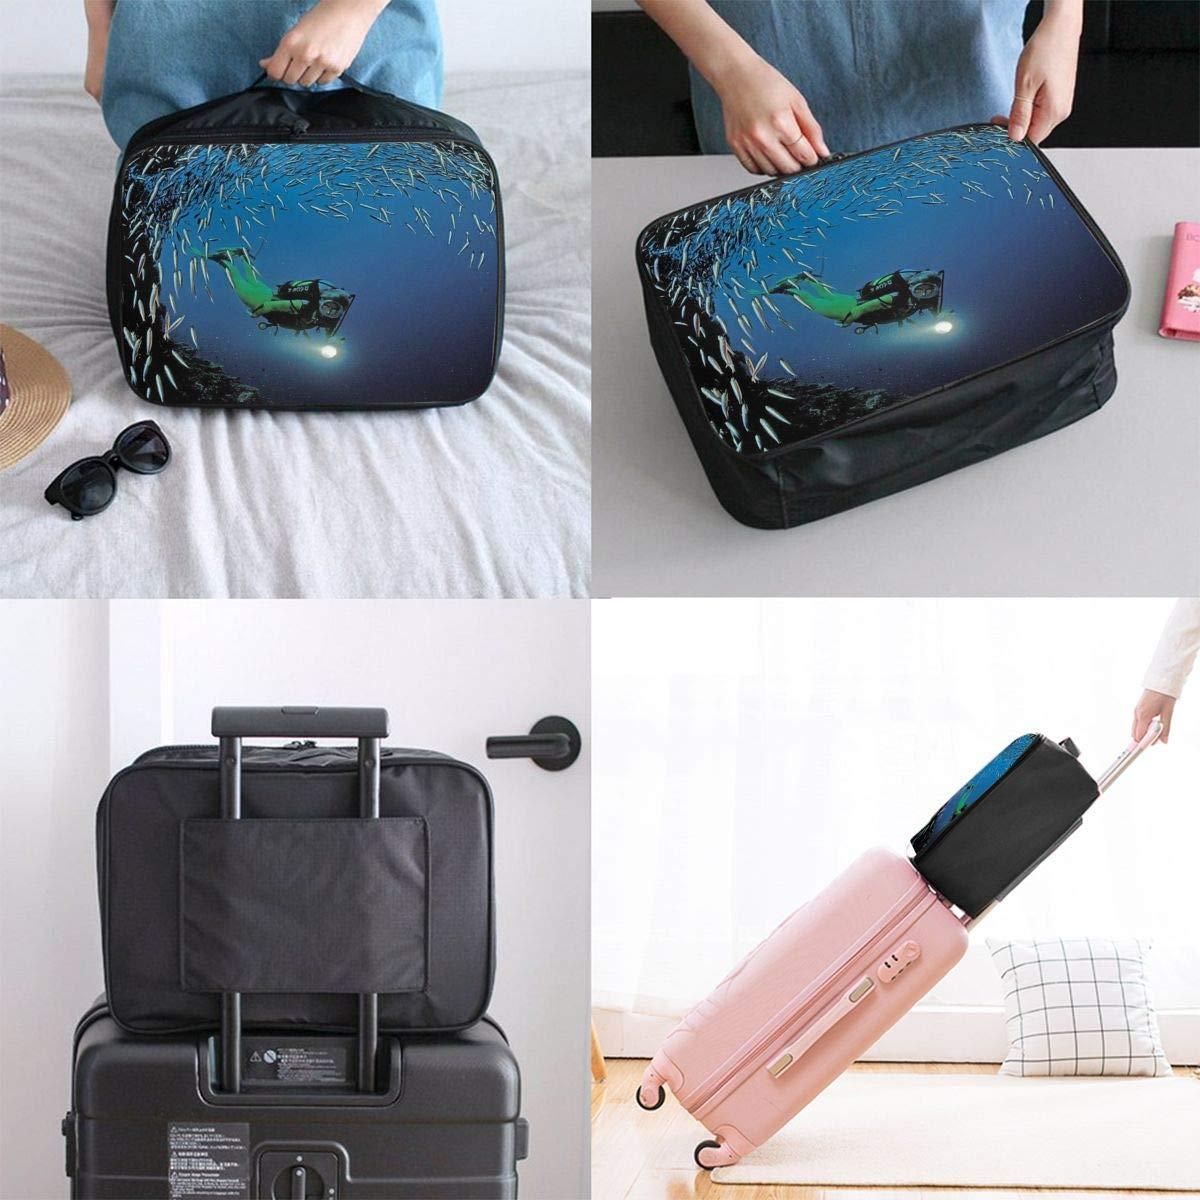 Lightweight Large Capacity Portable Duffel Bag for Men /& Women Diving Sport Travel Duffel Bag Backpack JTRVW Luggage Bags for Travel